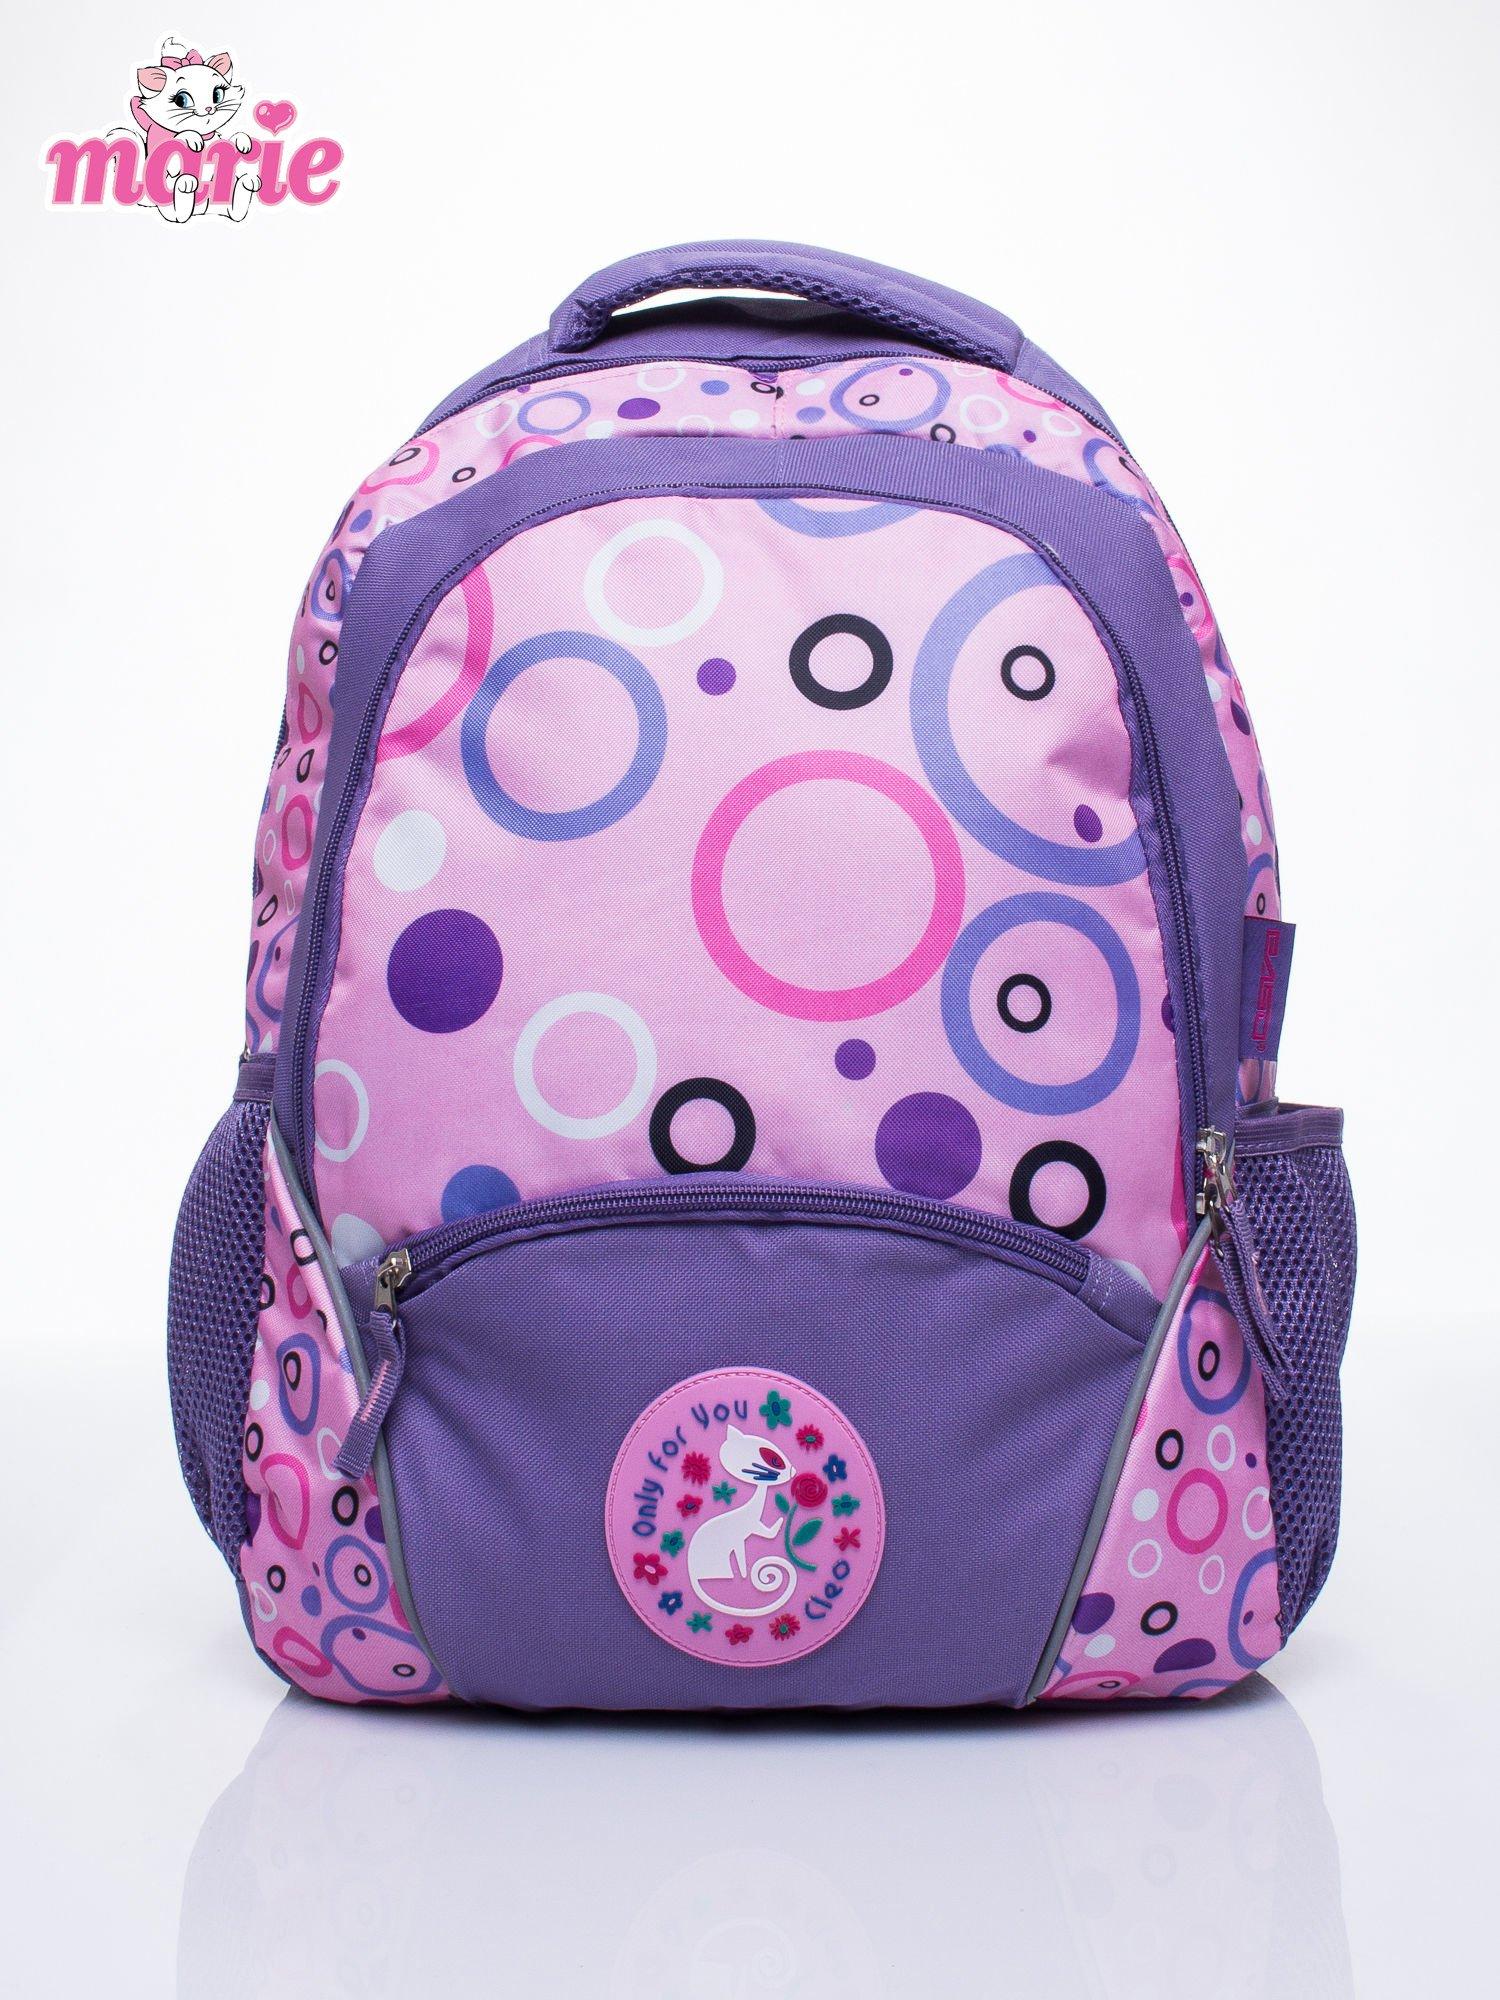 Fioletowy plecak szkolny DISNEY kotka Marie                                  zdj.                                  1